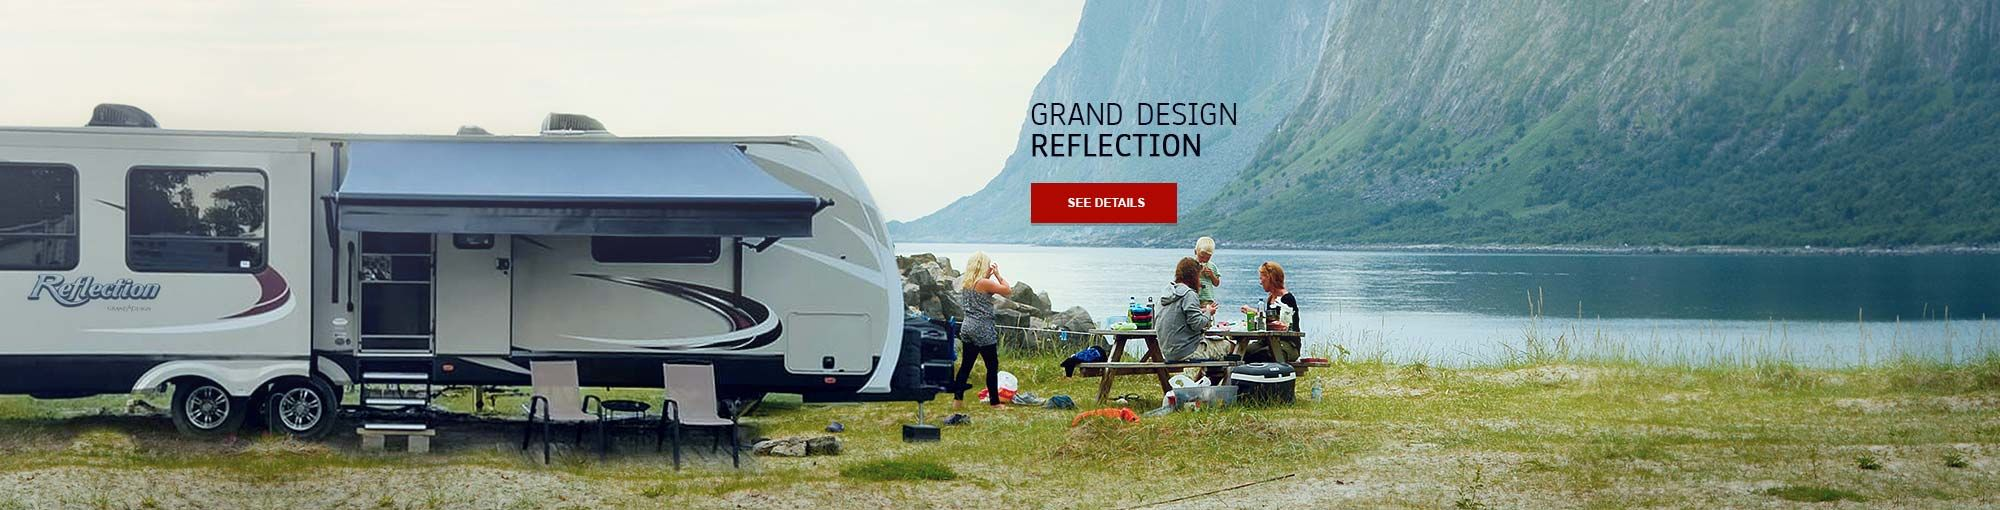 Grand Design Reflextion v2